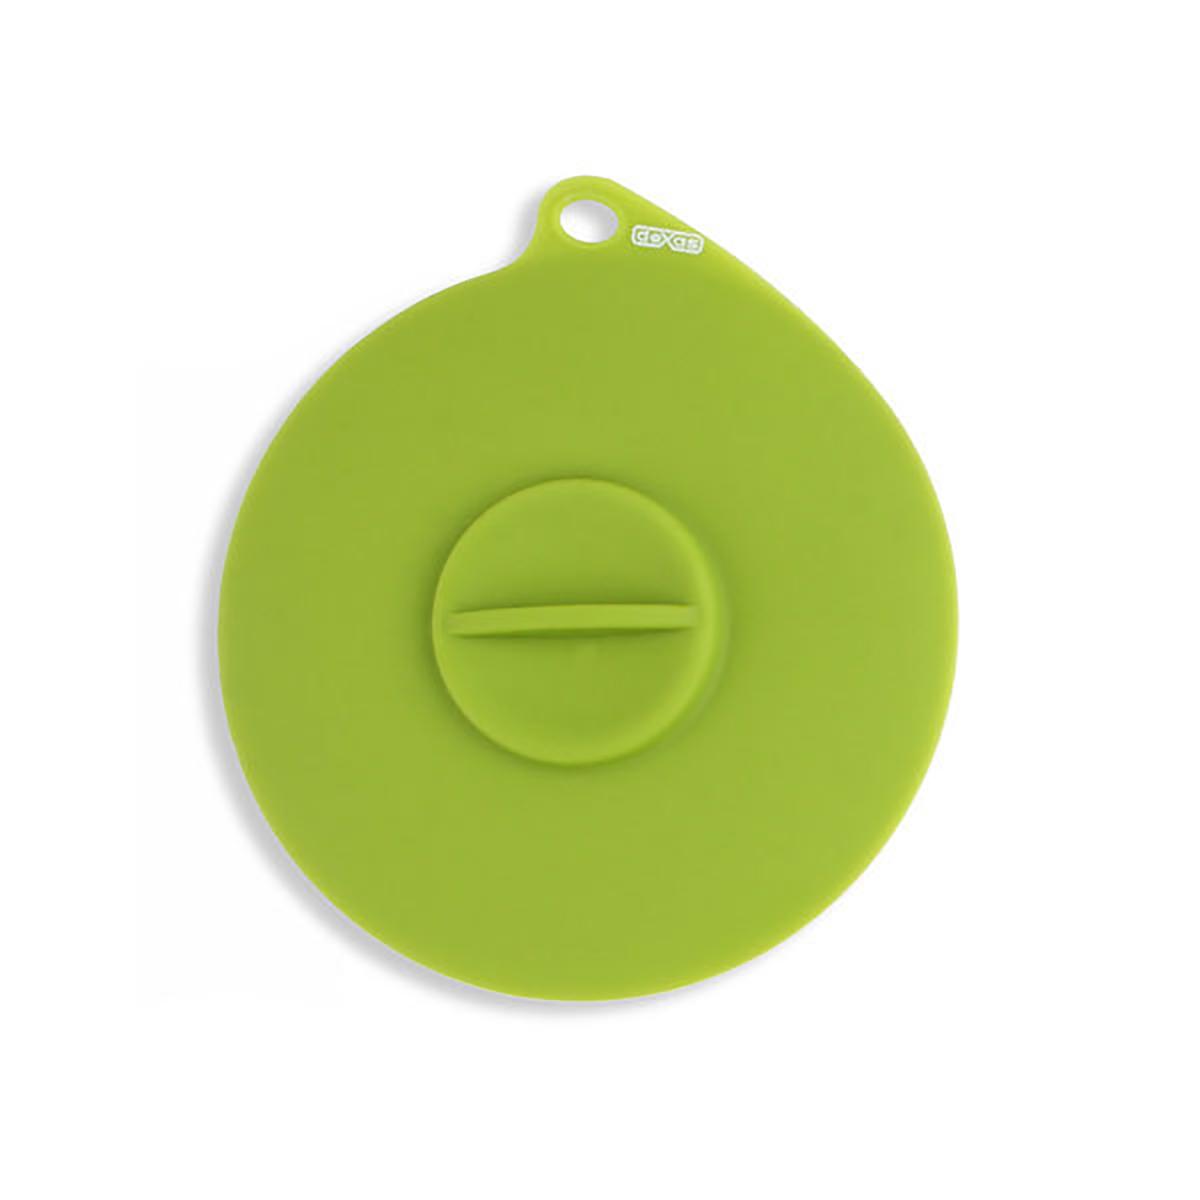 Flexible Suction Lid by Popware - Green